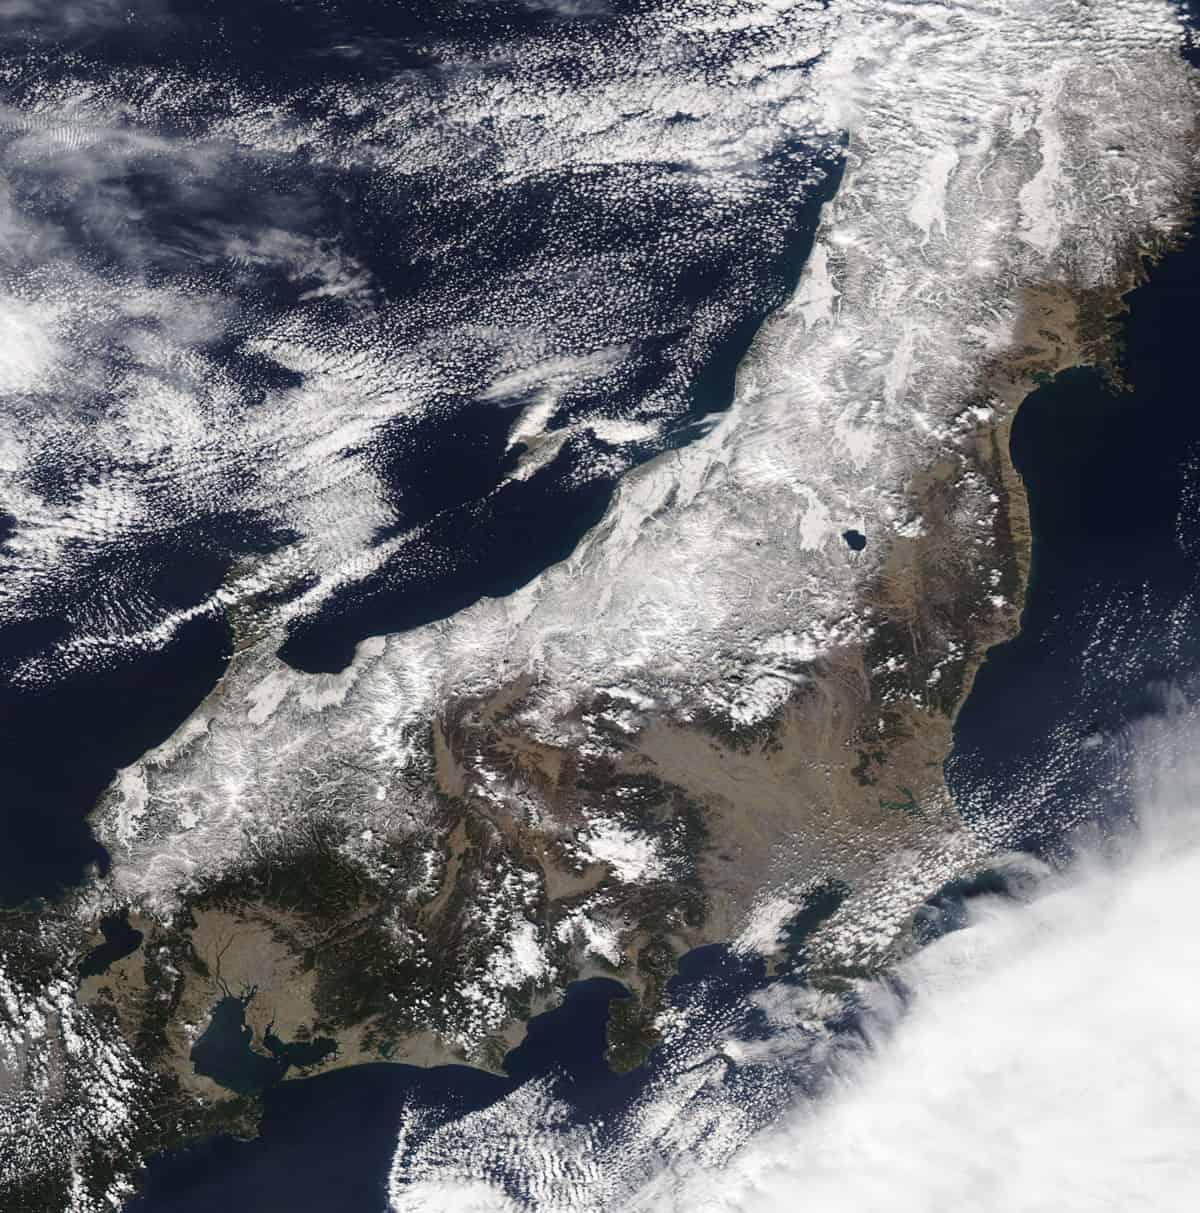 Aqua satellite image of northwestern Honshu Island covered in snow on February 26, 2018. Image; NASA.